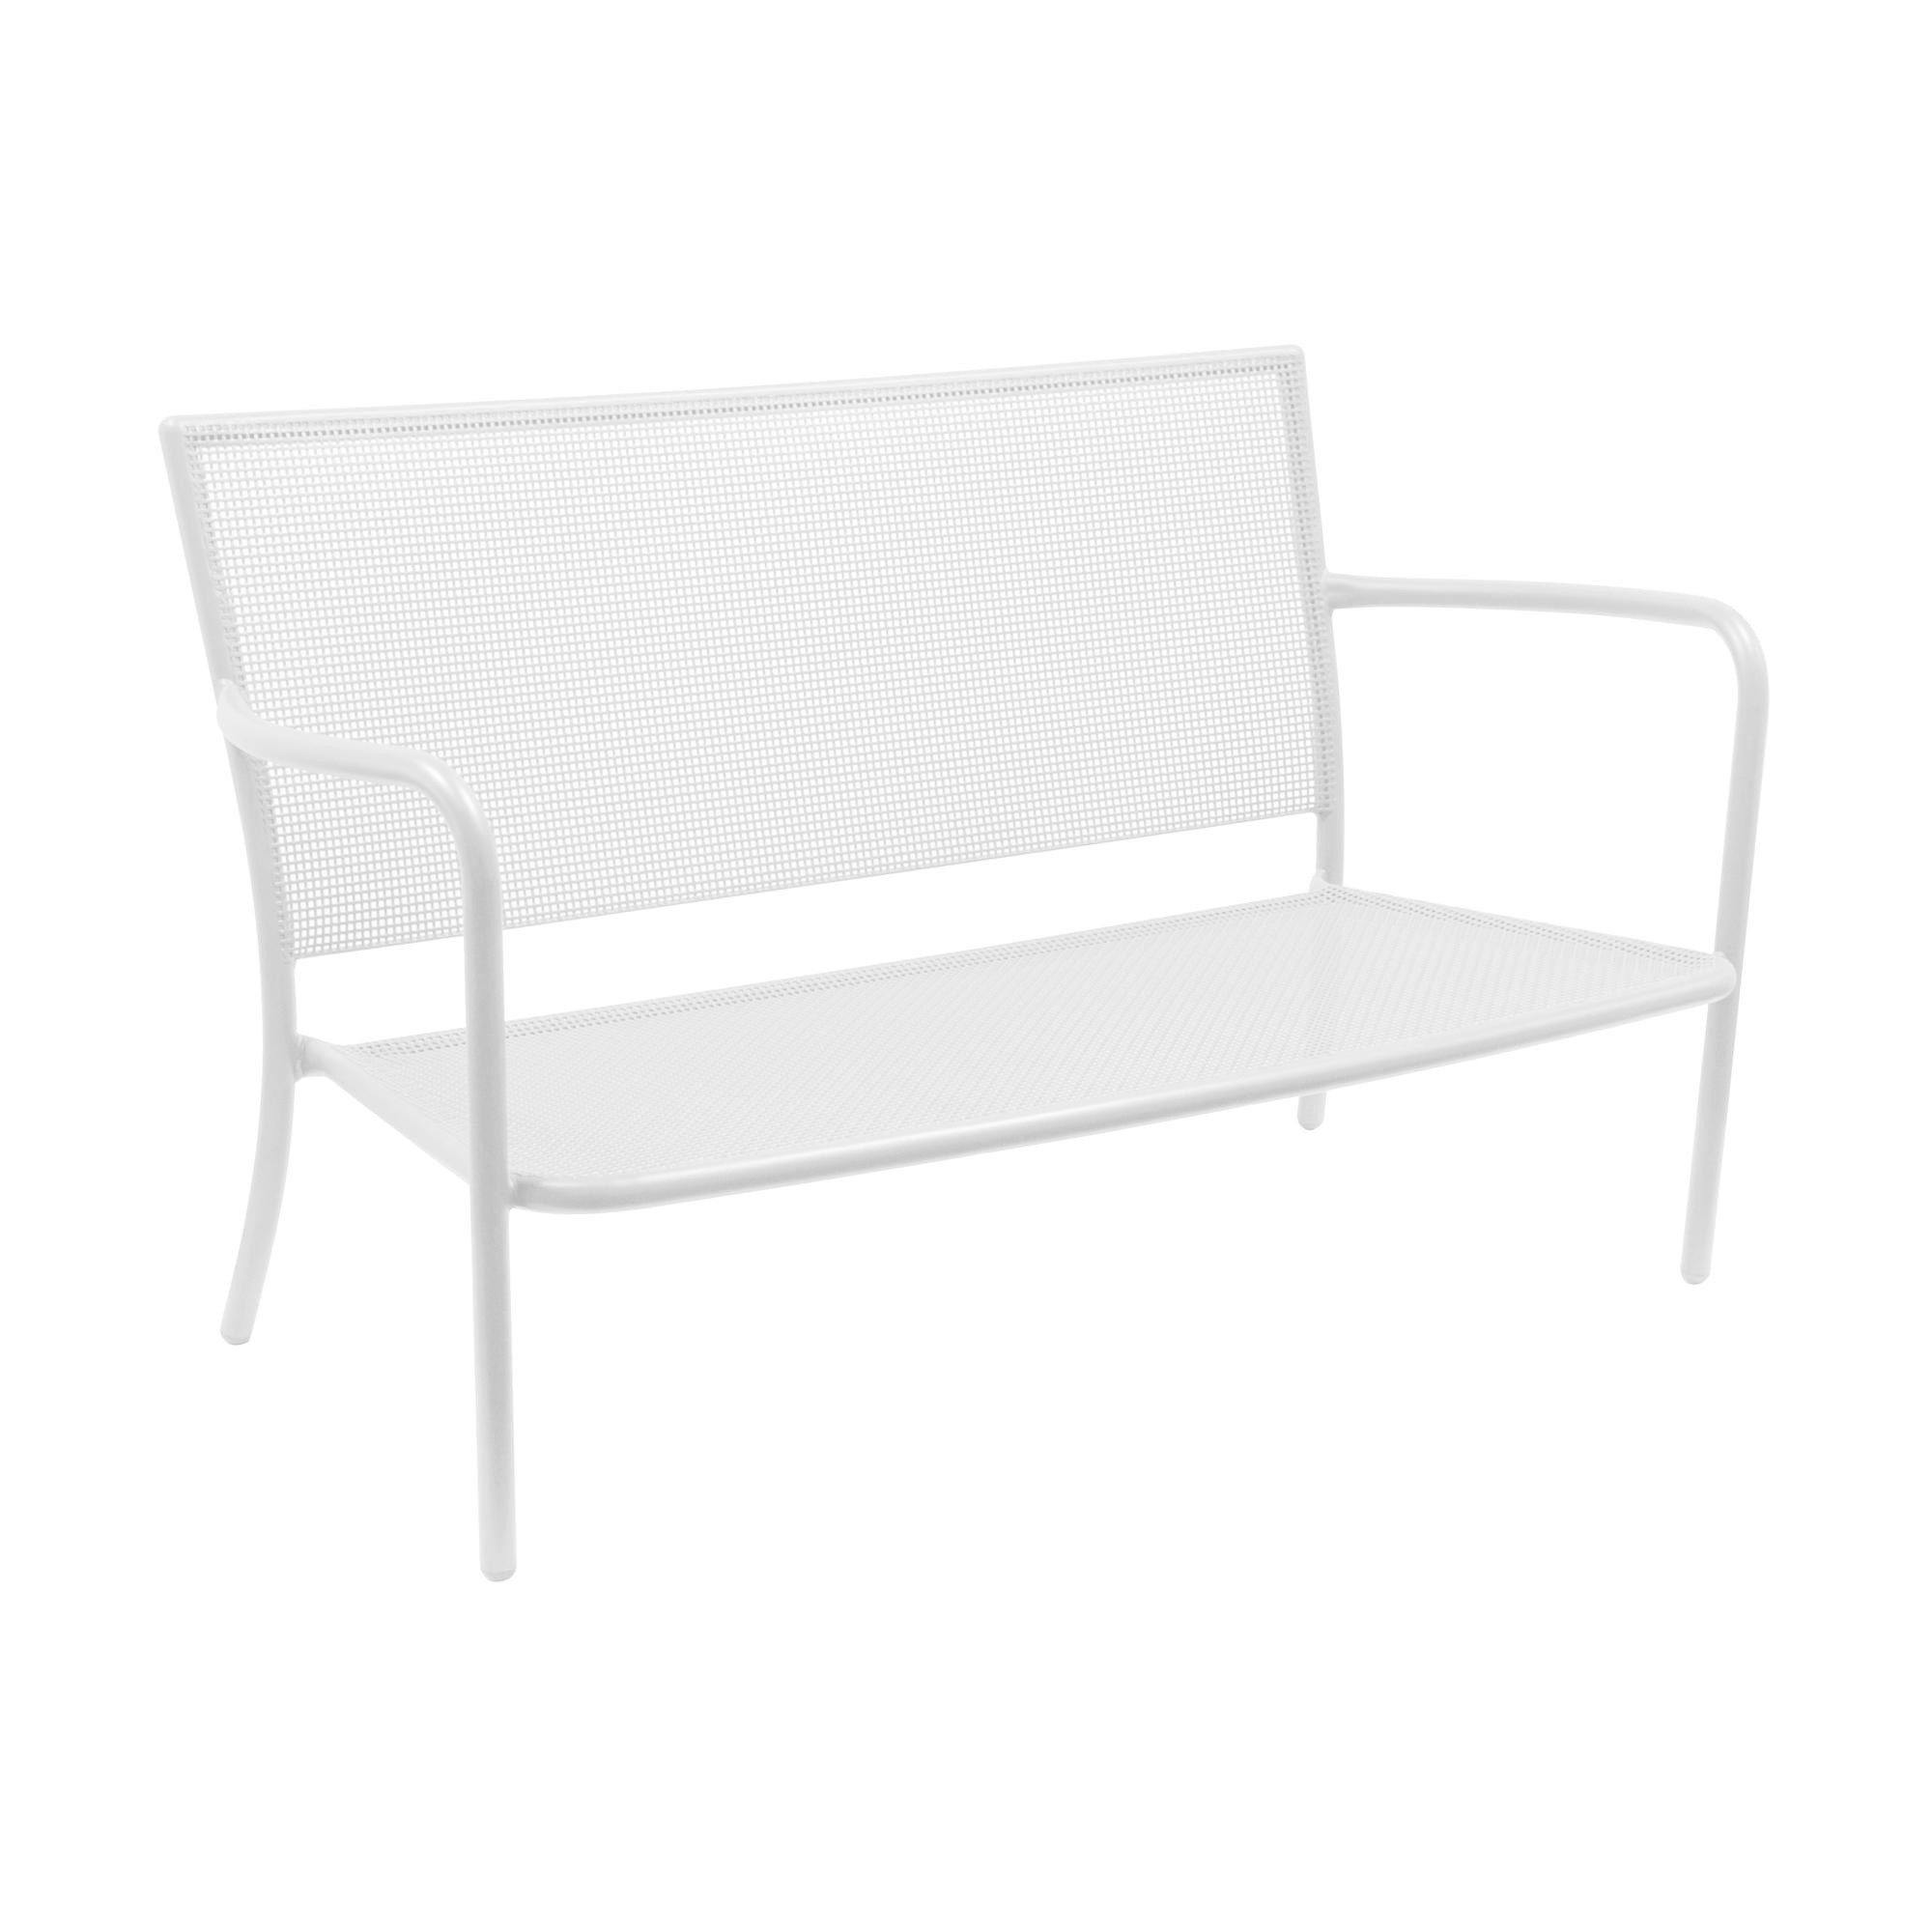 Strange Athena 2 Seater Garden Sofa Creativecarmelina Interior Chair Design Creativecarmelinacom